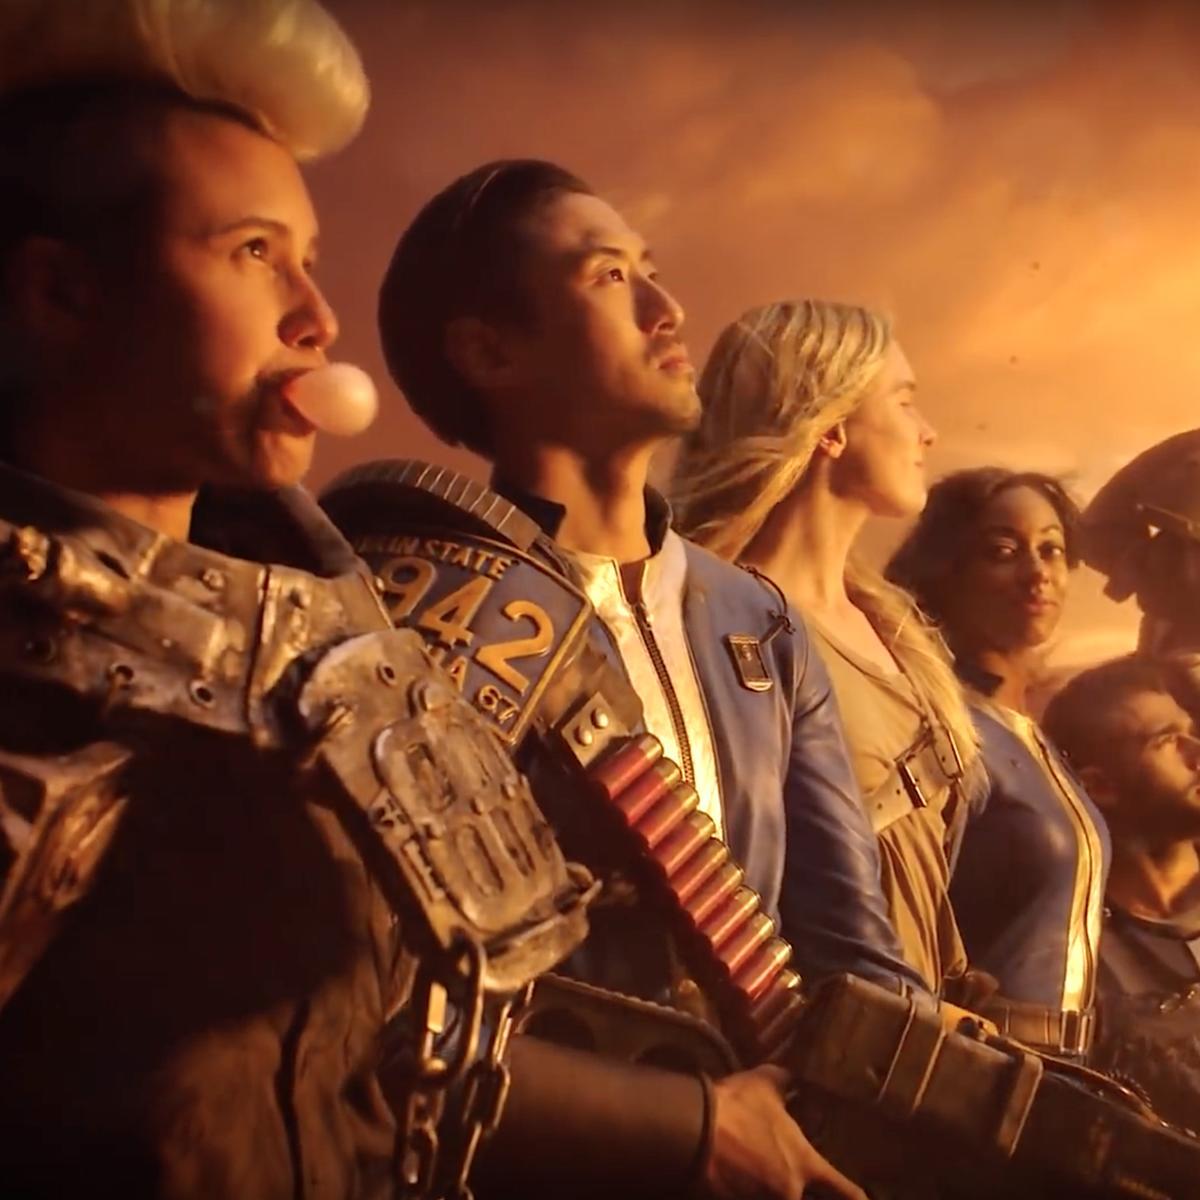 Fallout 76 live action trailer